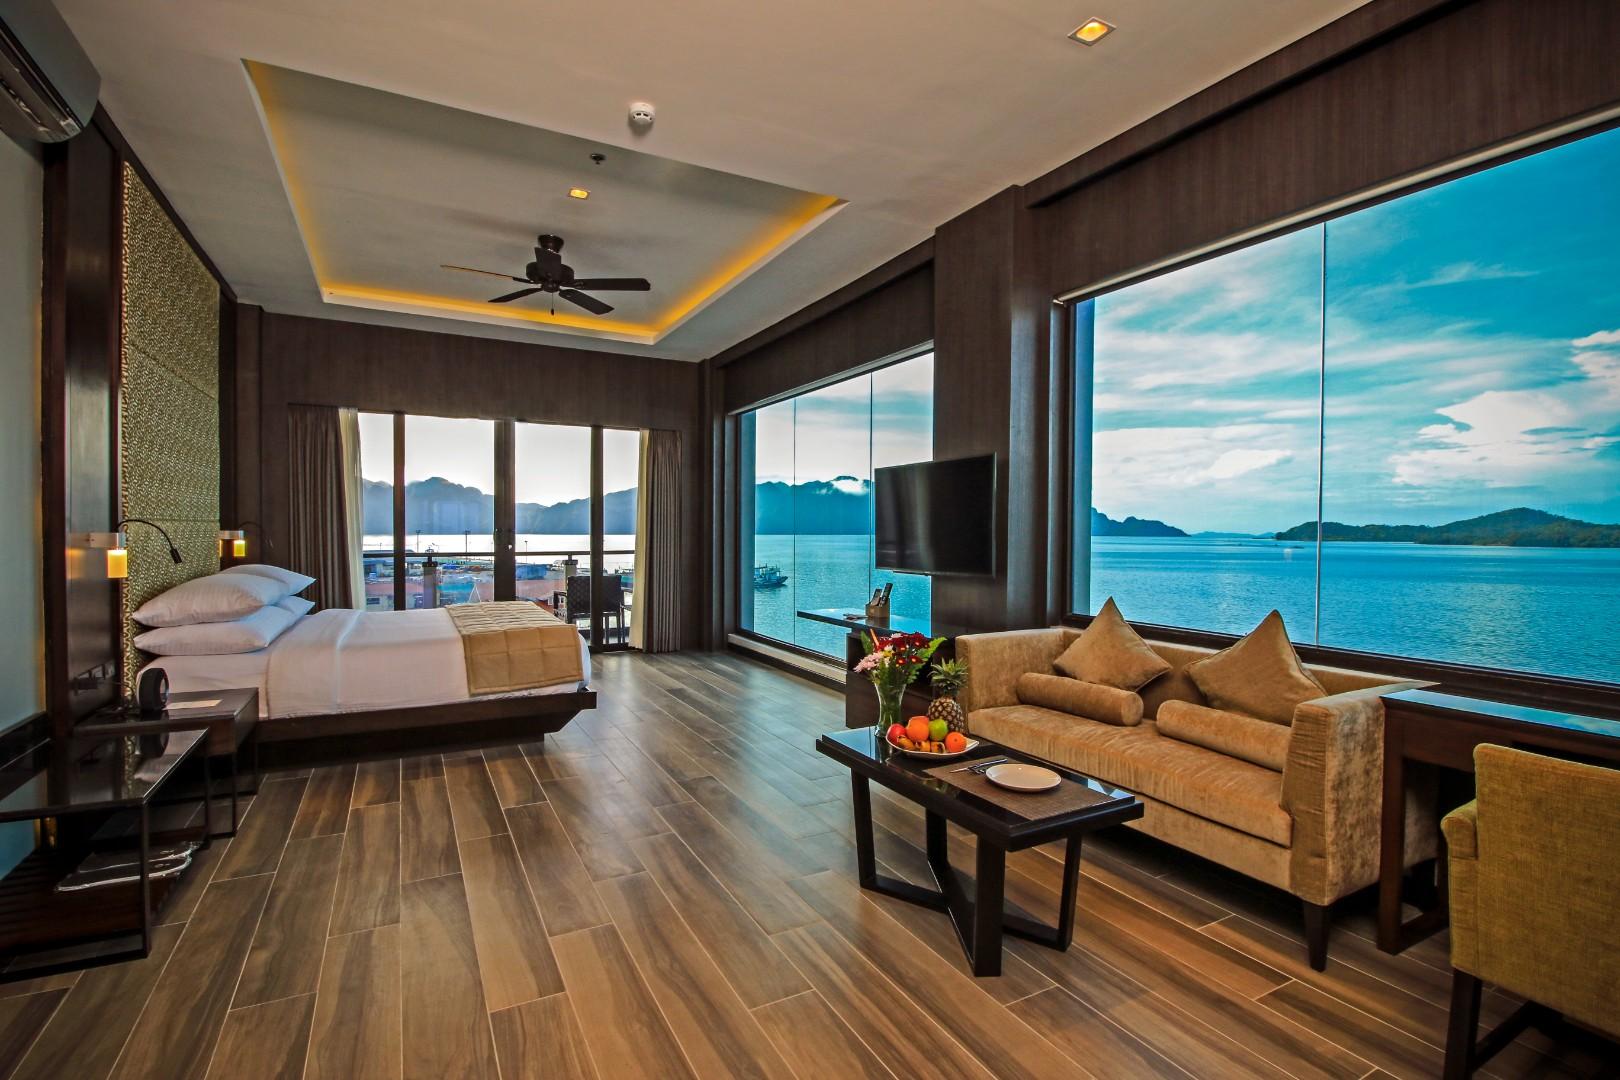 Two Seasons Coron Bayside Hotel Palawan Accommodation